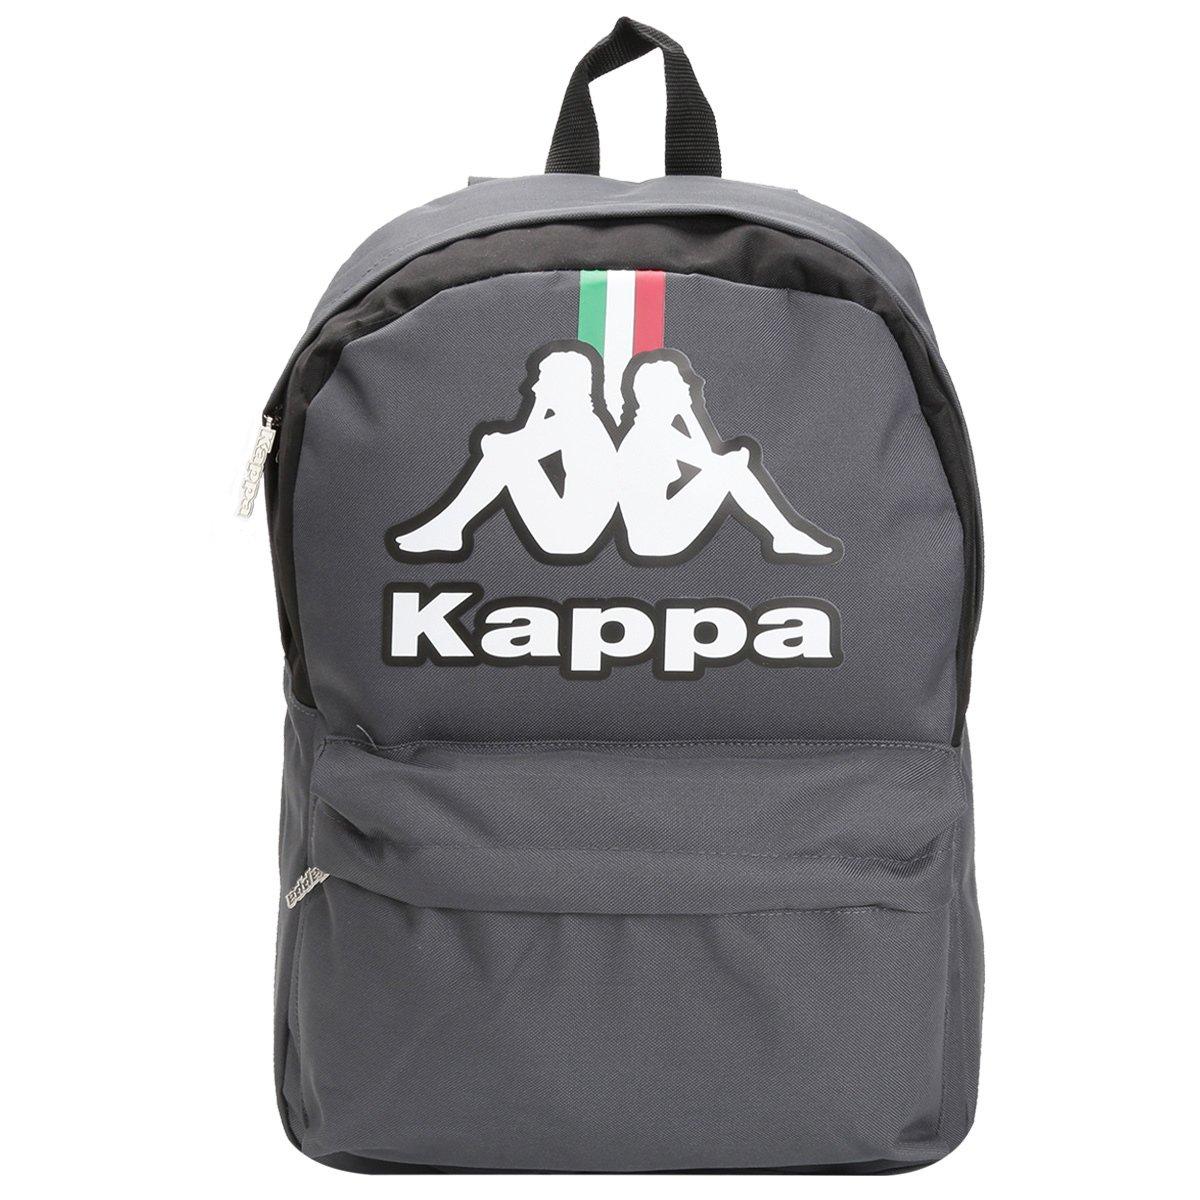 Mochila Média Italia Kappa KP4087001-041 Chumbo Preto 4c6f09bebb9c2